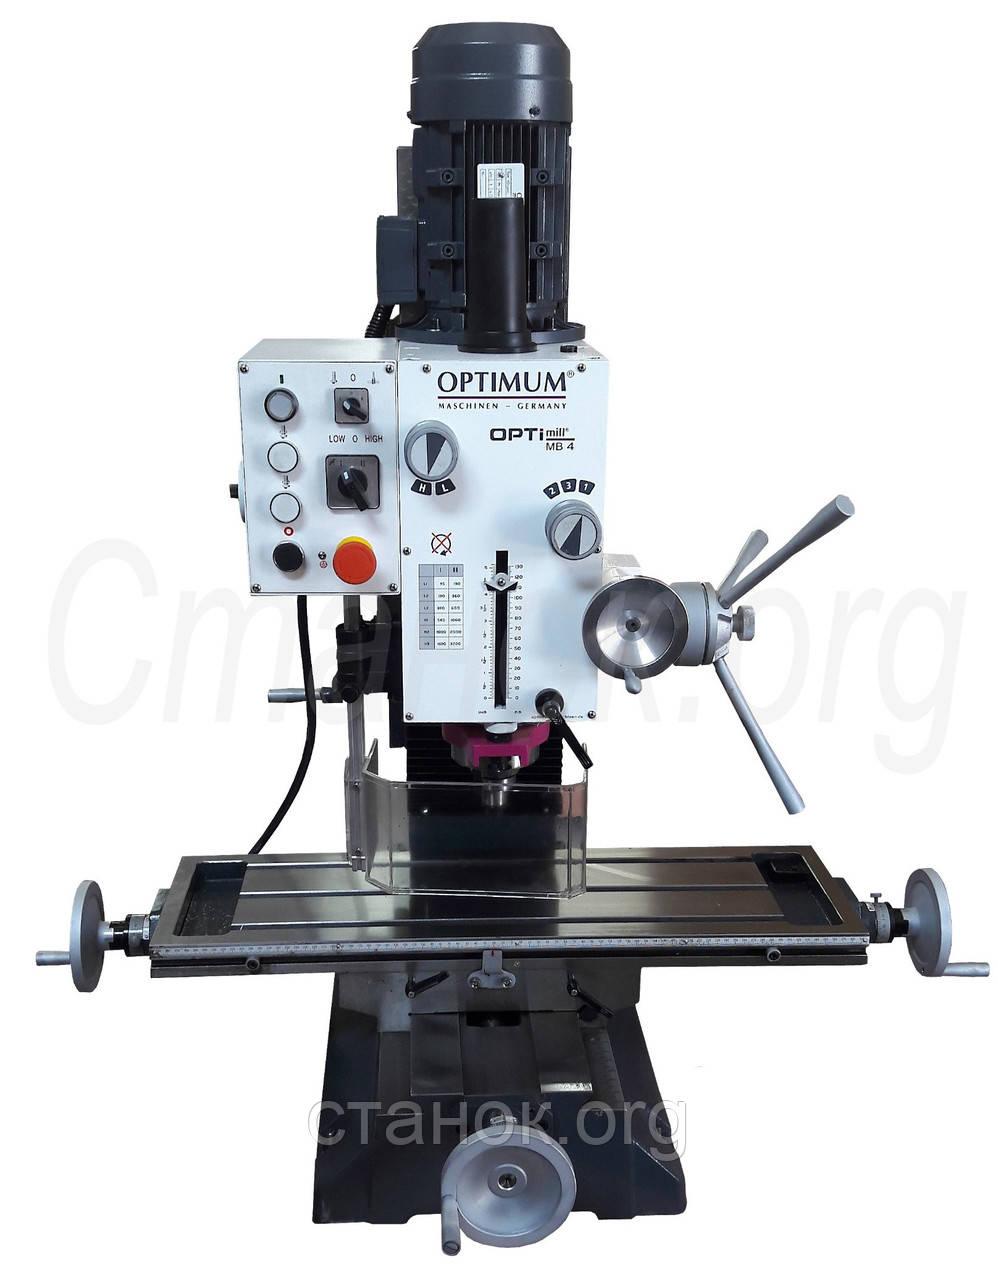 OPTImill MB 4 фрезерный станок по металлу фрезерний верстат Optimum резьбонарезной оптимум мб 4